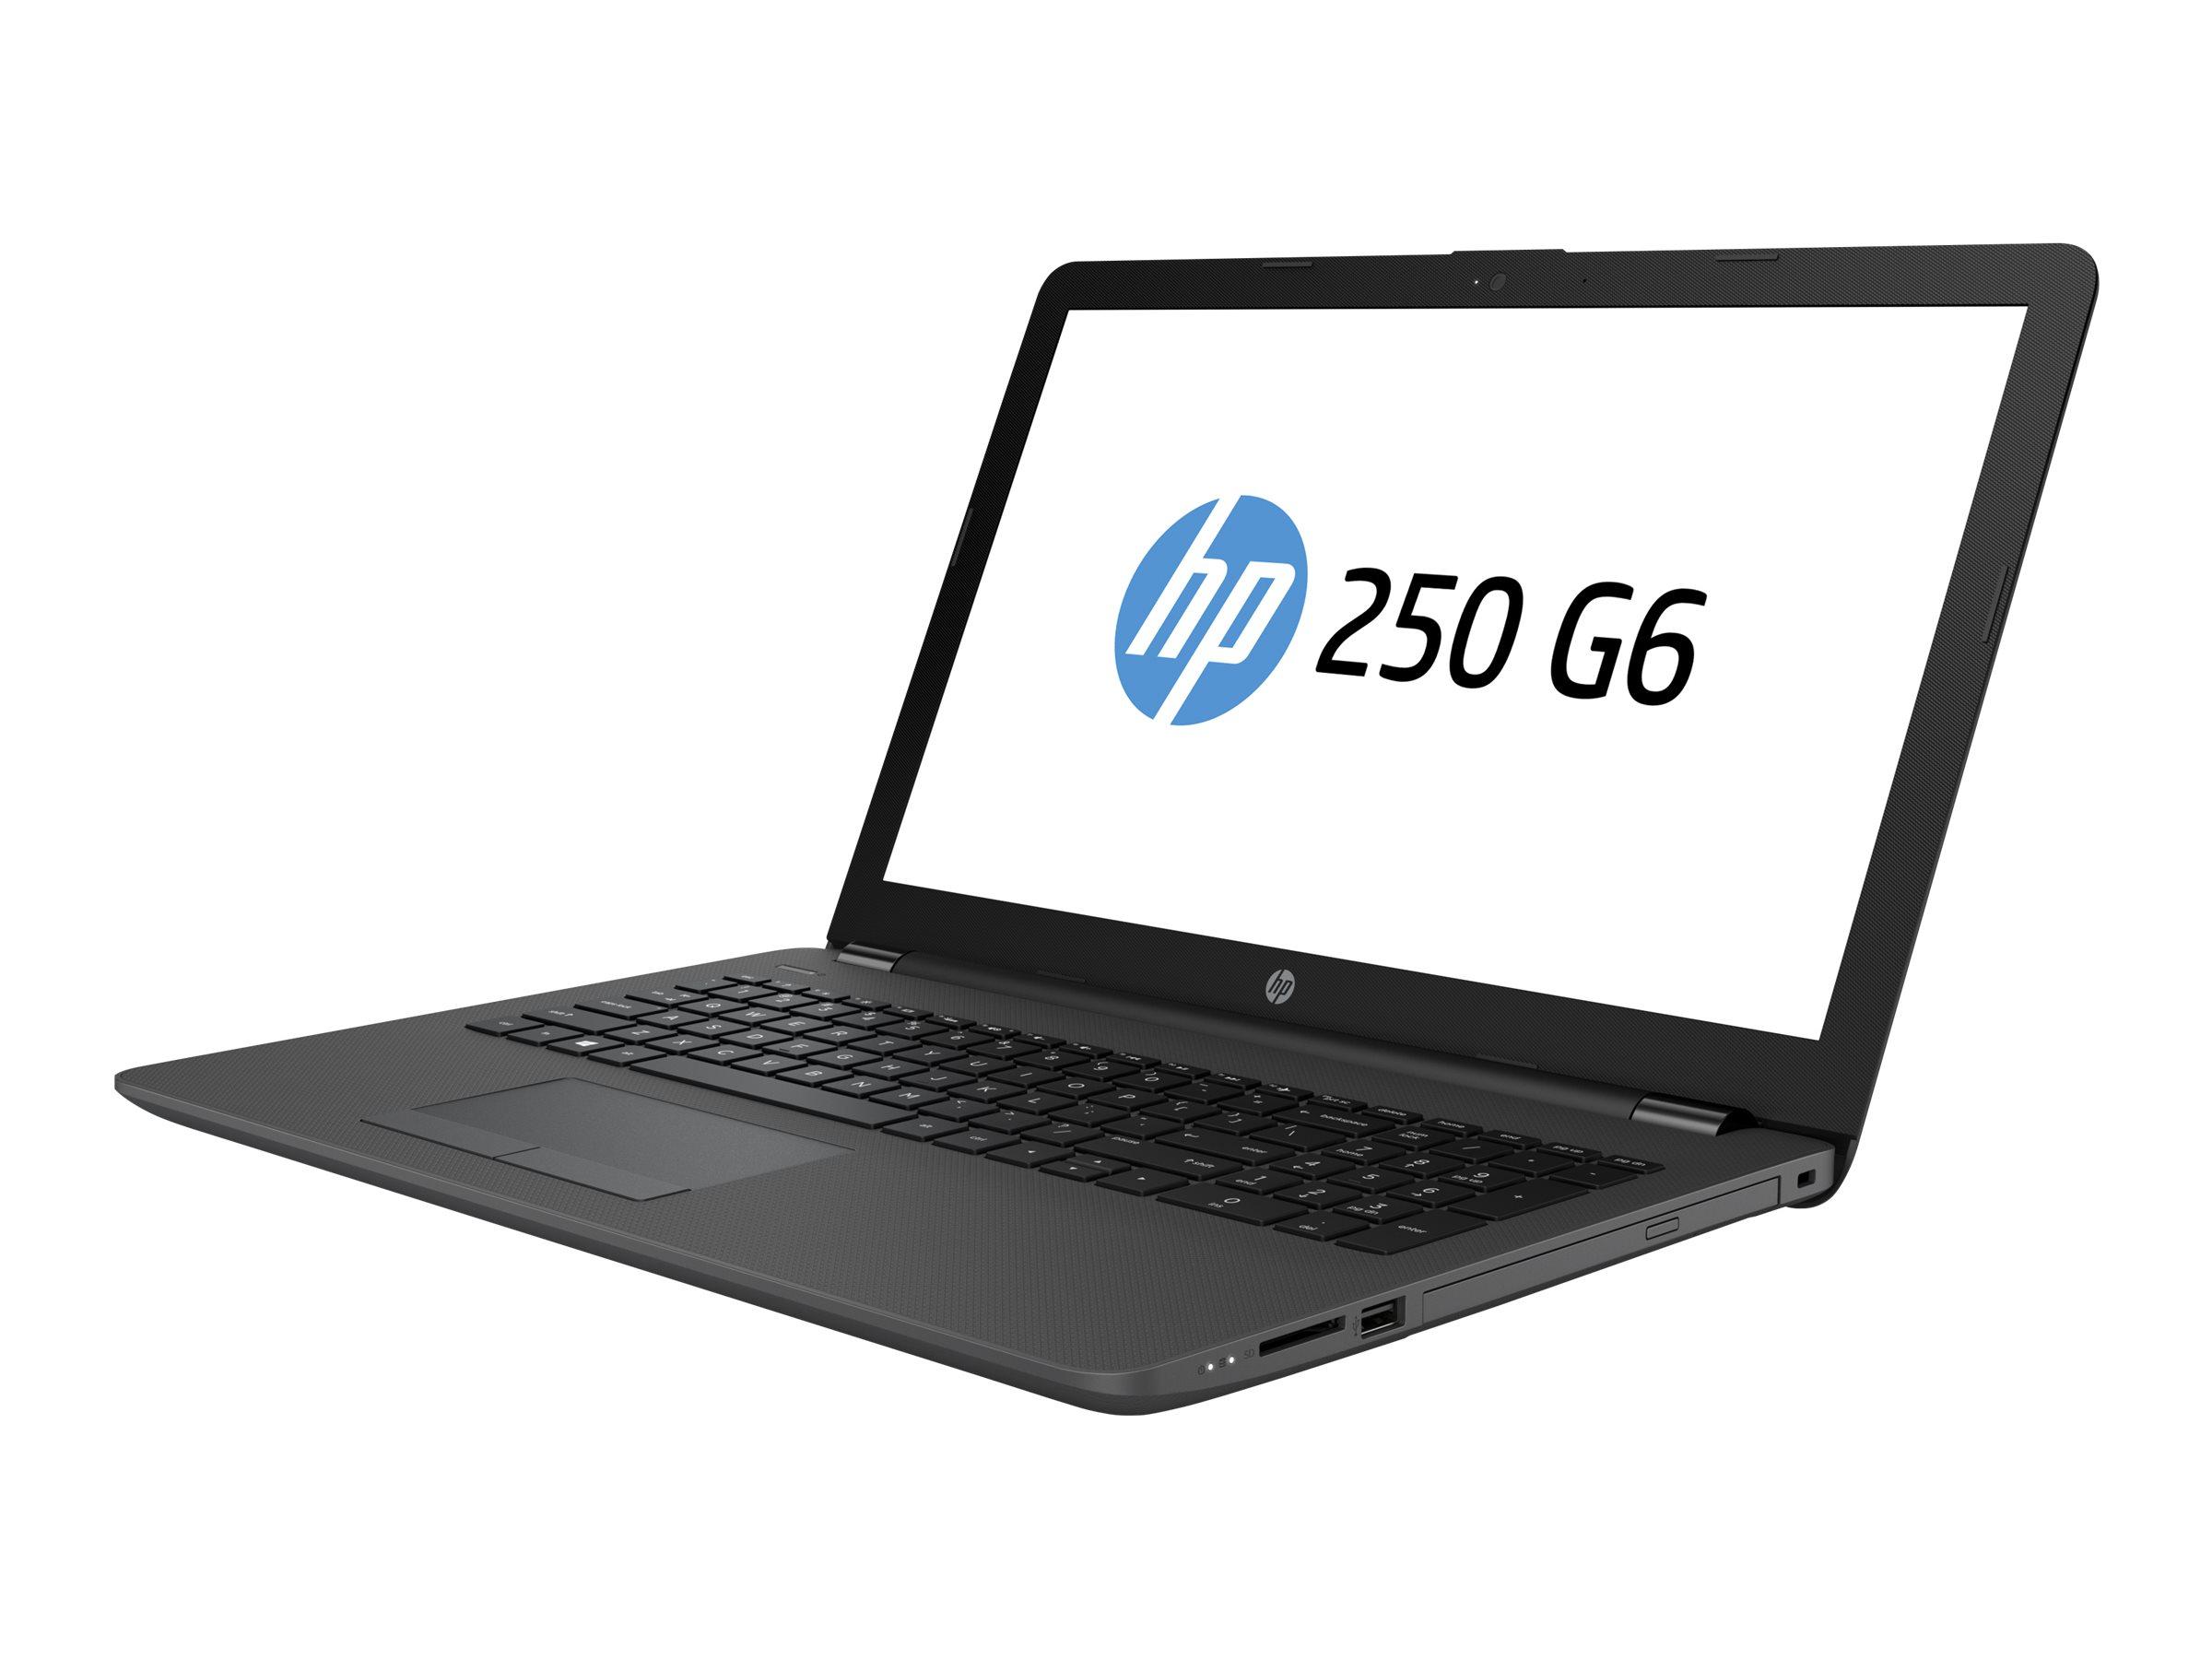 "HP Pavilion G6 39 - 15,6"" Notebook - Core i3 Mobile 2 GHz 39,6 cm"